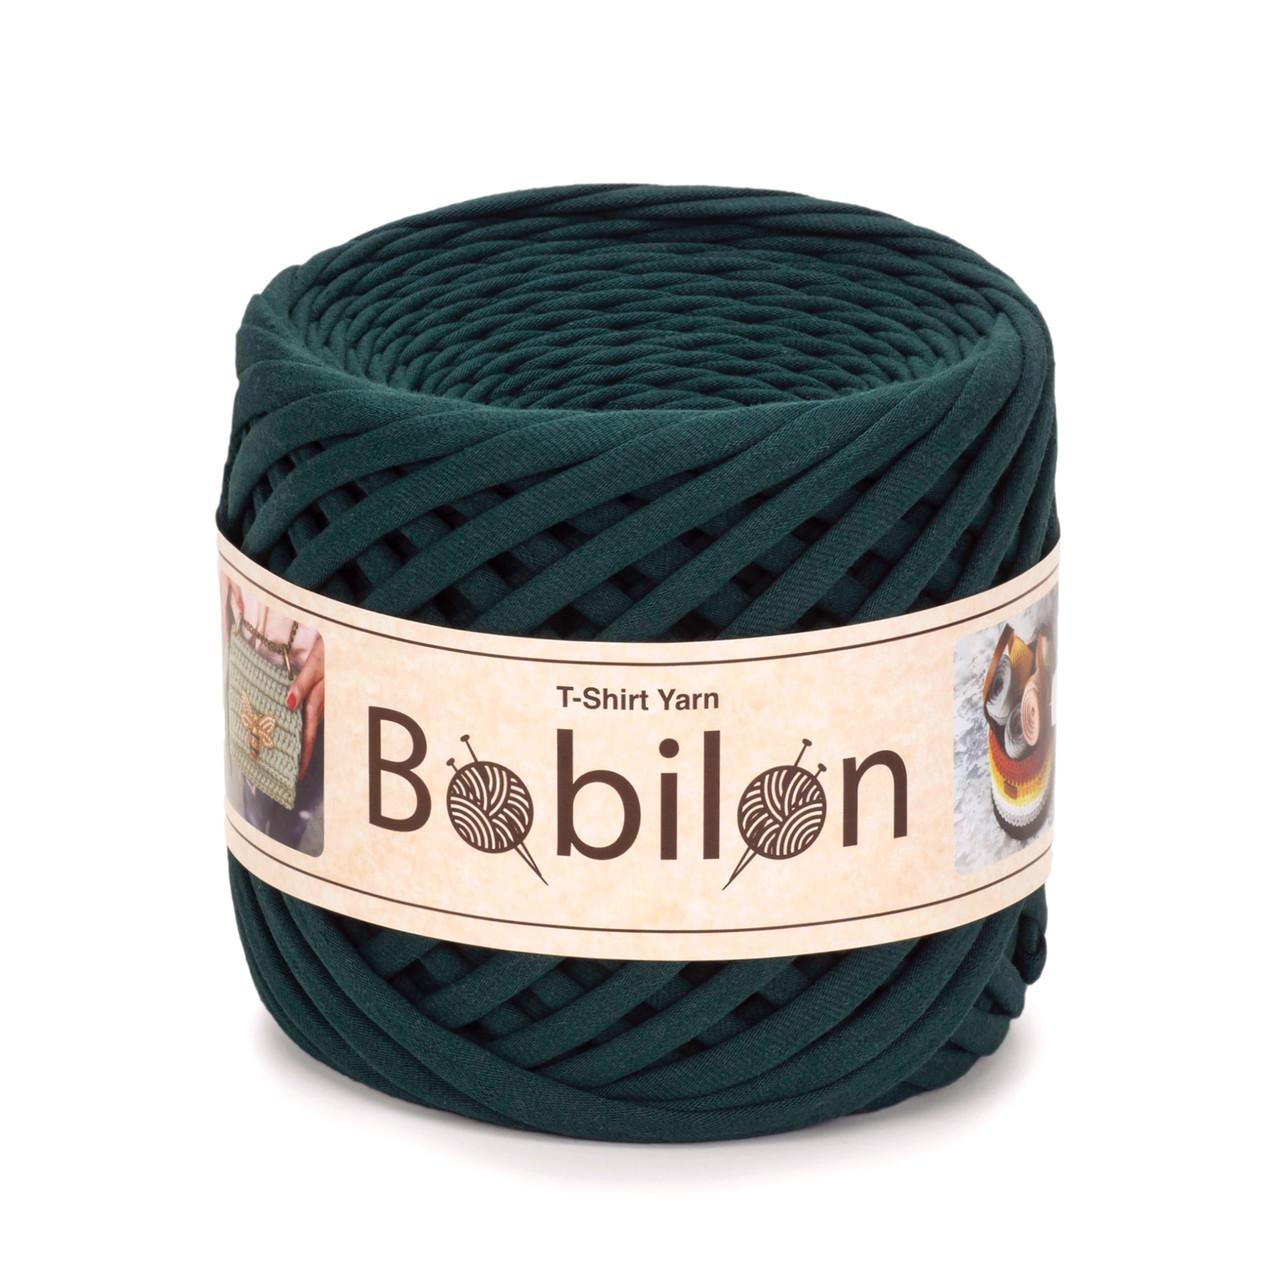 Трикотажная пряжа Бобилон Micro (3-5мм) Ultramarine Green Темно-зеленый